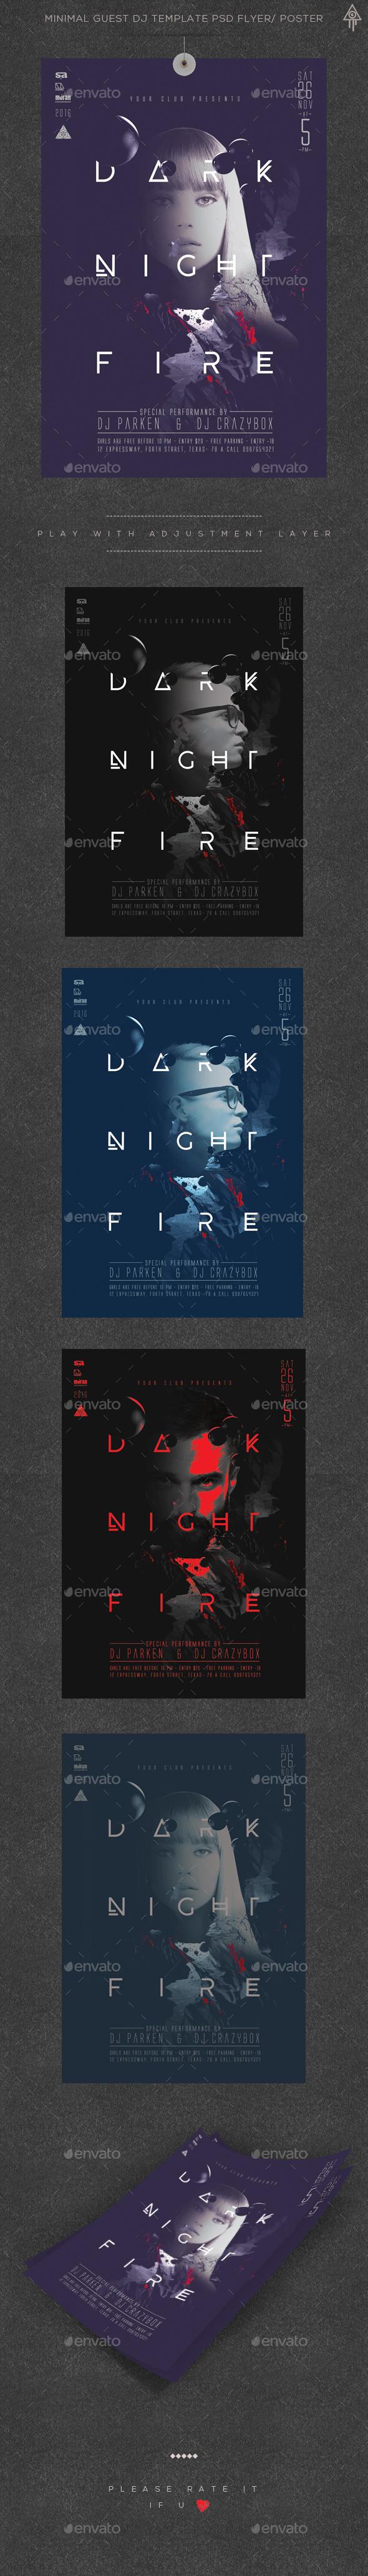 Minimal Dark Night Guest Dj Poster / Flyer - Clubs & Parties Events